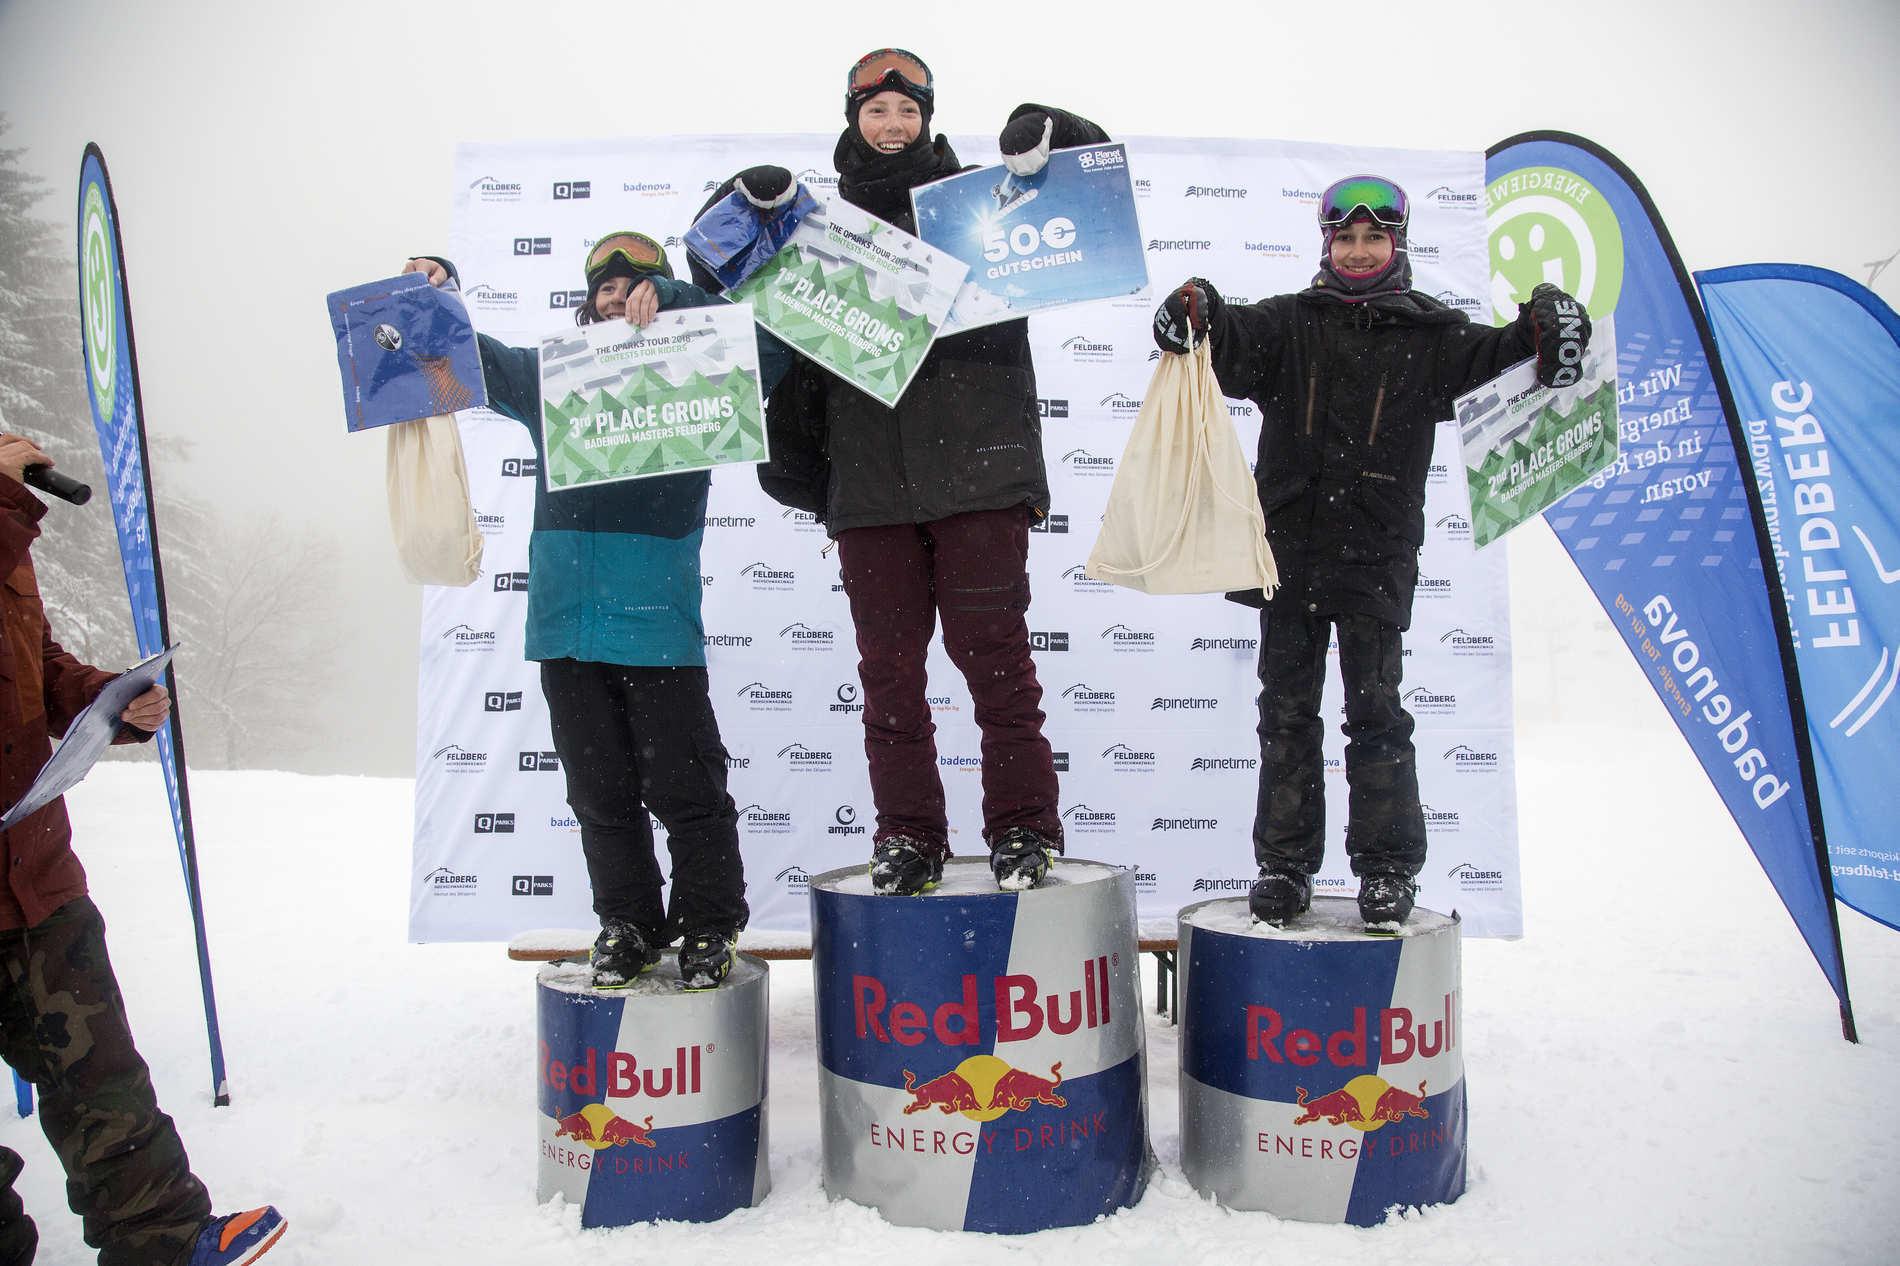 web snowpark feldberg 17 02 2018 lifestyle fs sb martin herrmann qparks 34